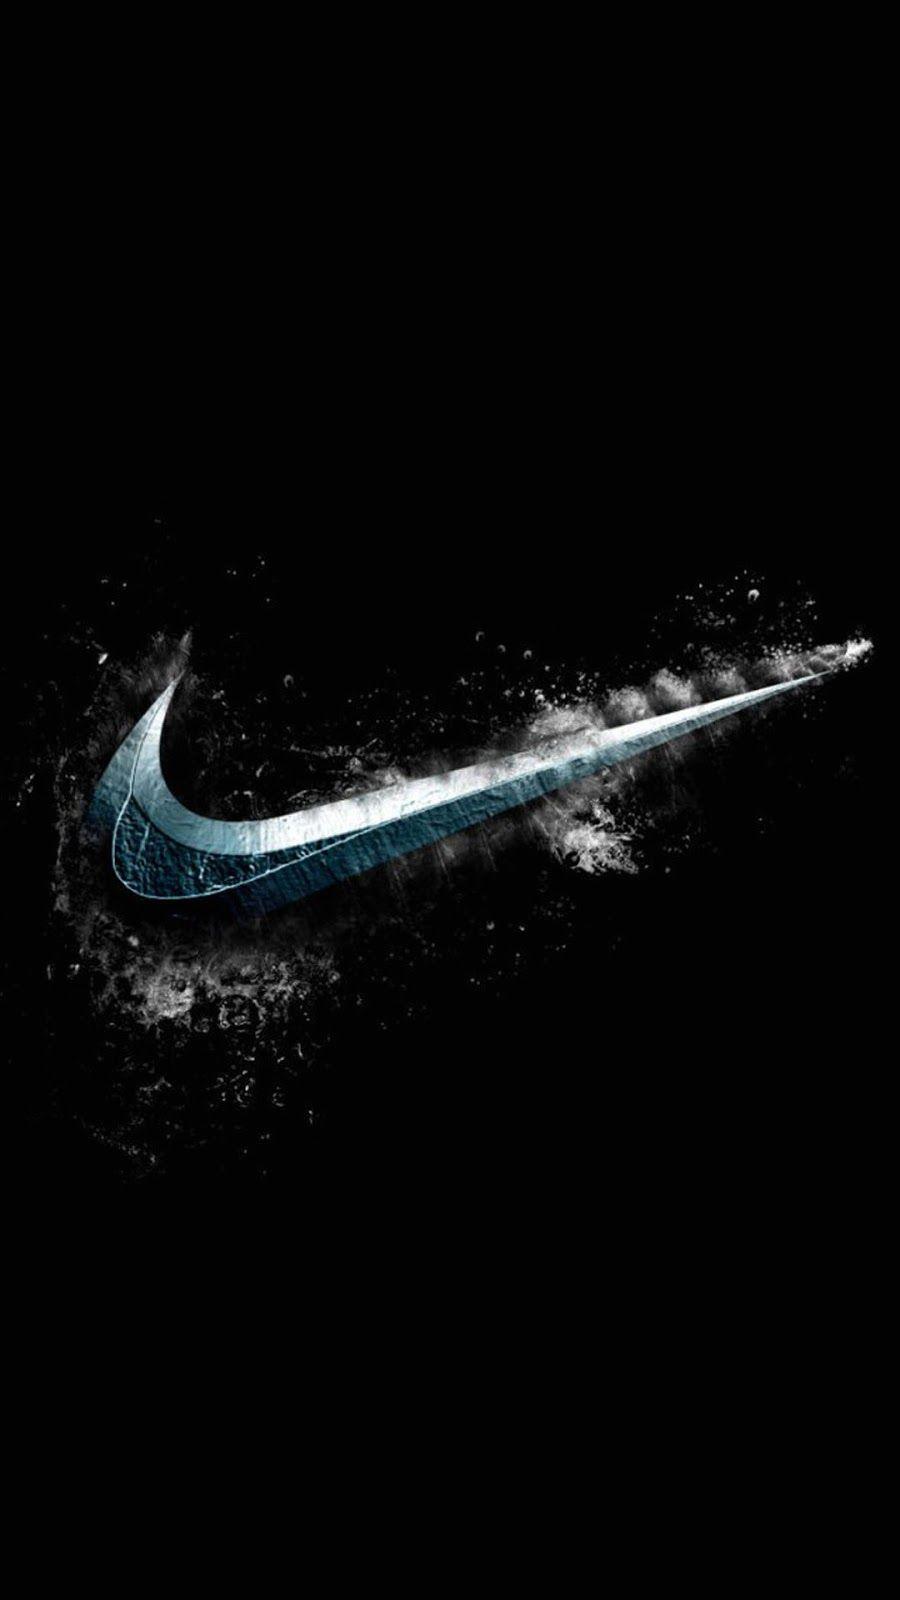 Nike Iphone Wallpapers Hd In 2020 Nike Wallpaper Nike Logo Wallpapers Nike Wallpaper Iphone